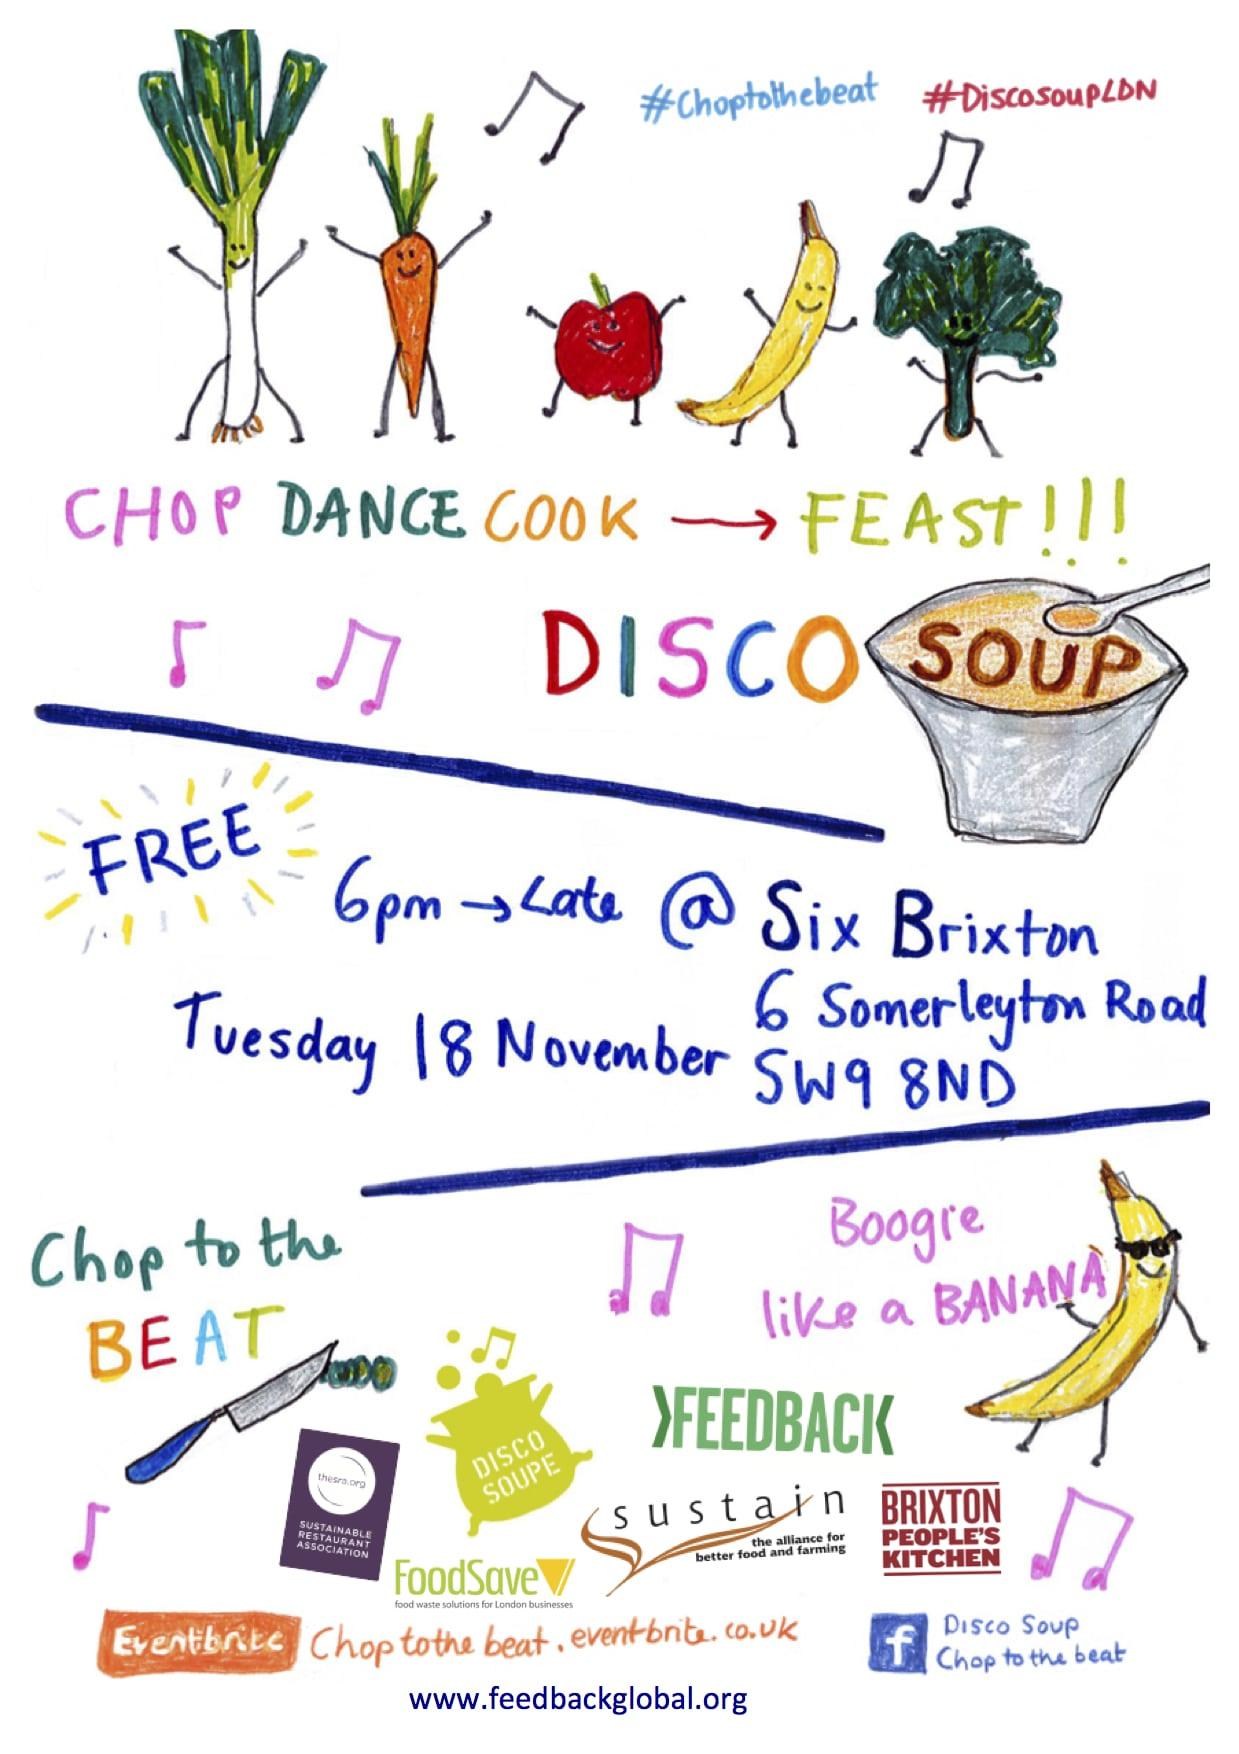 Disco Soup London All logos